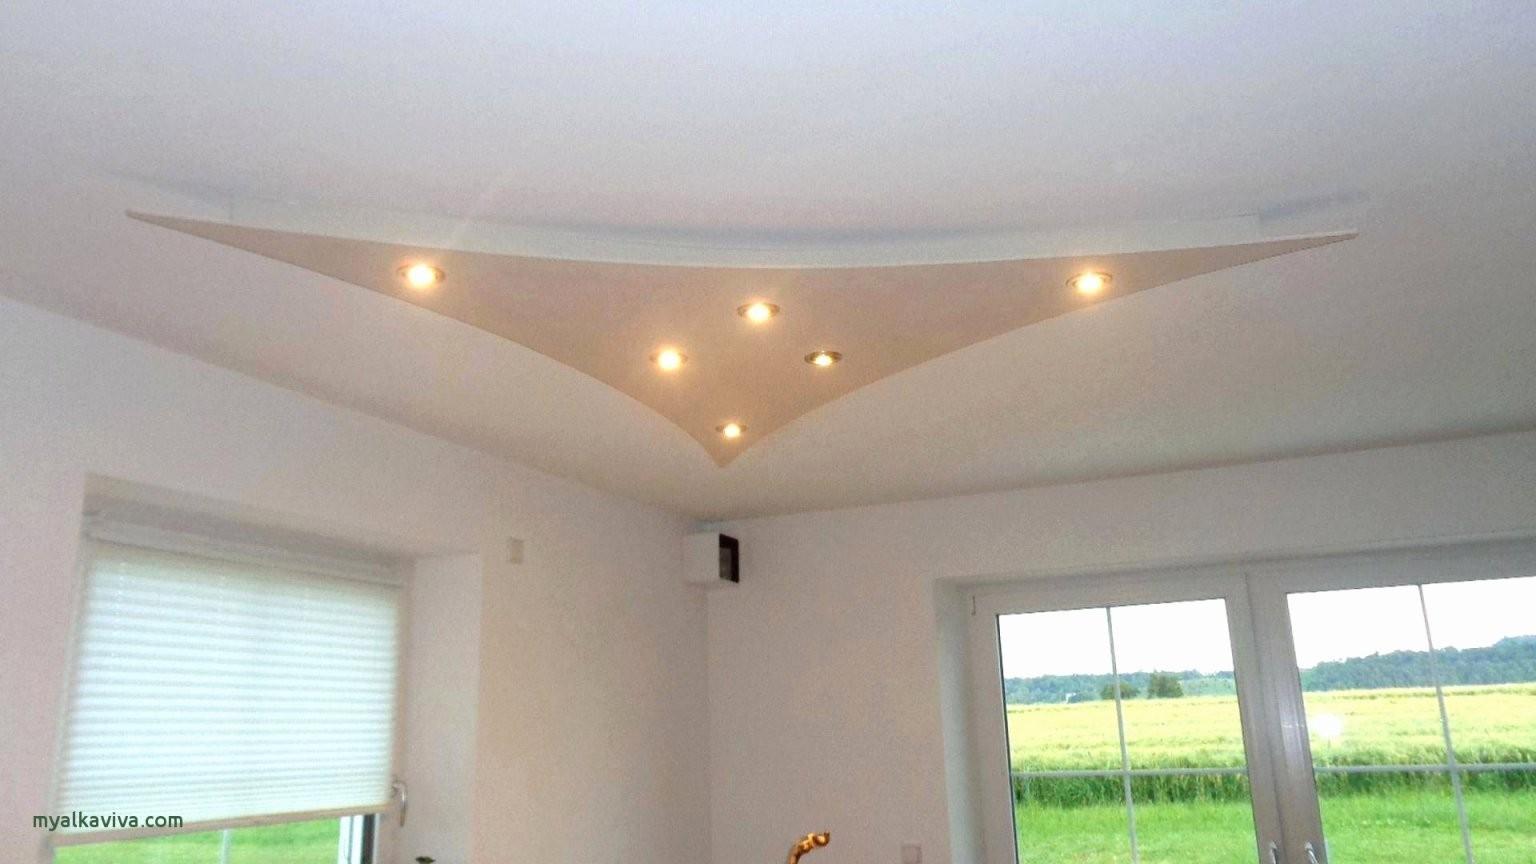 Indirekte Beleuchtung Selber Bauen Rigips Inspirierend Wohnzimmer von Indirekte Beleuchtung Selber Bauen Wand Photo